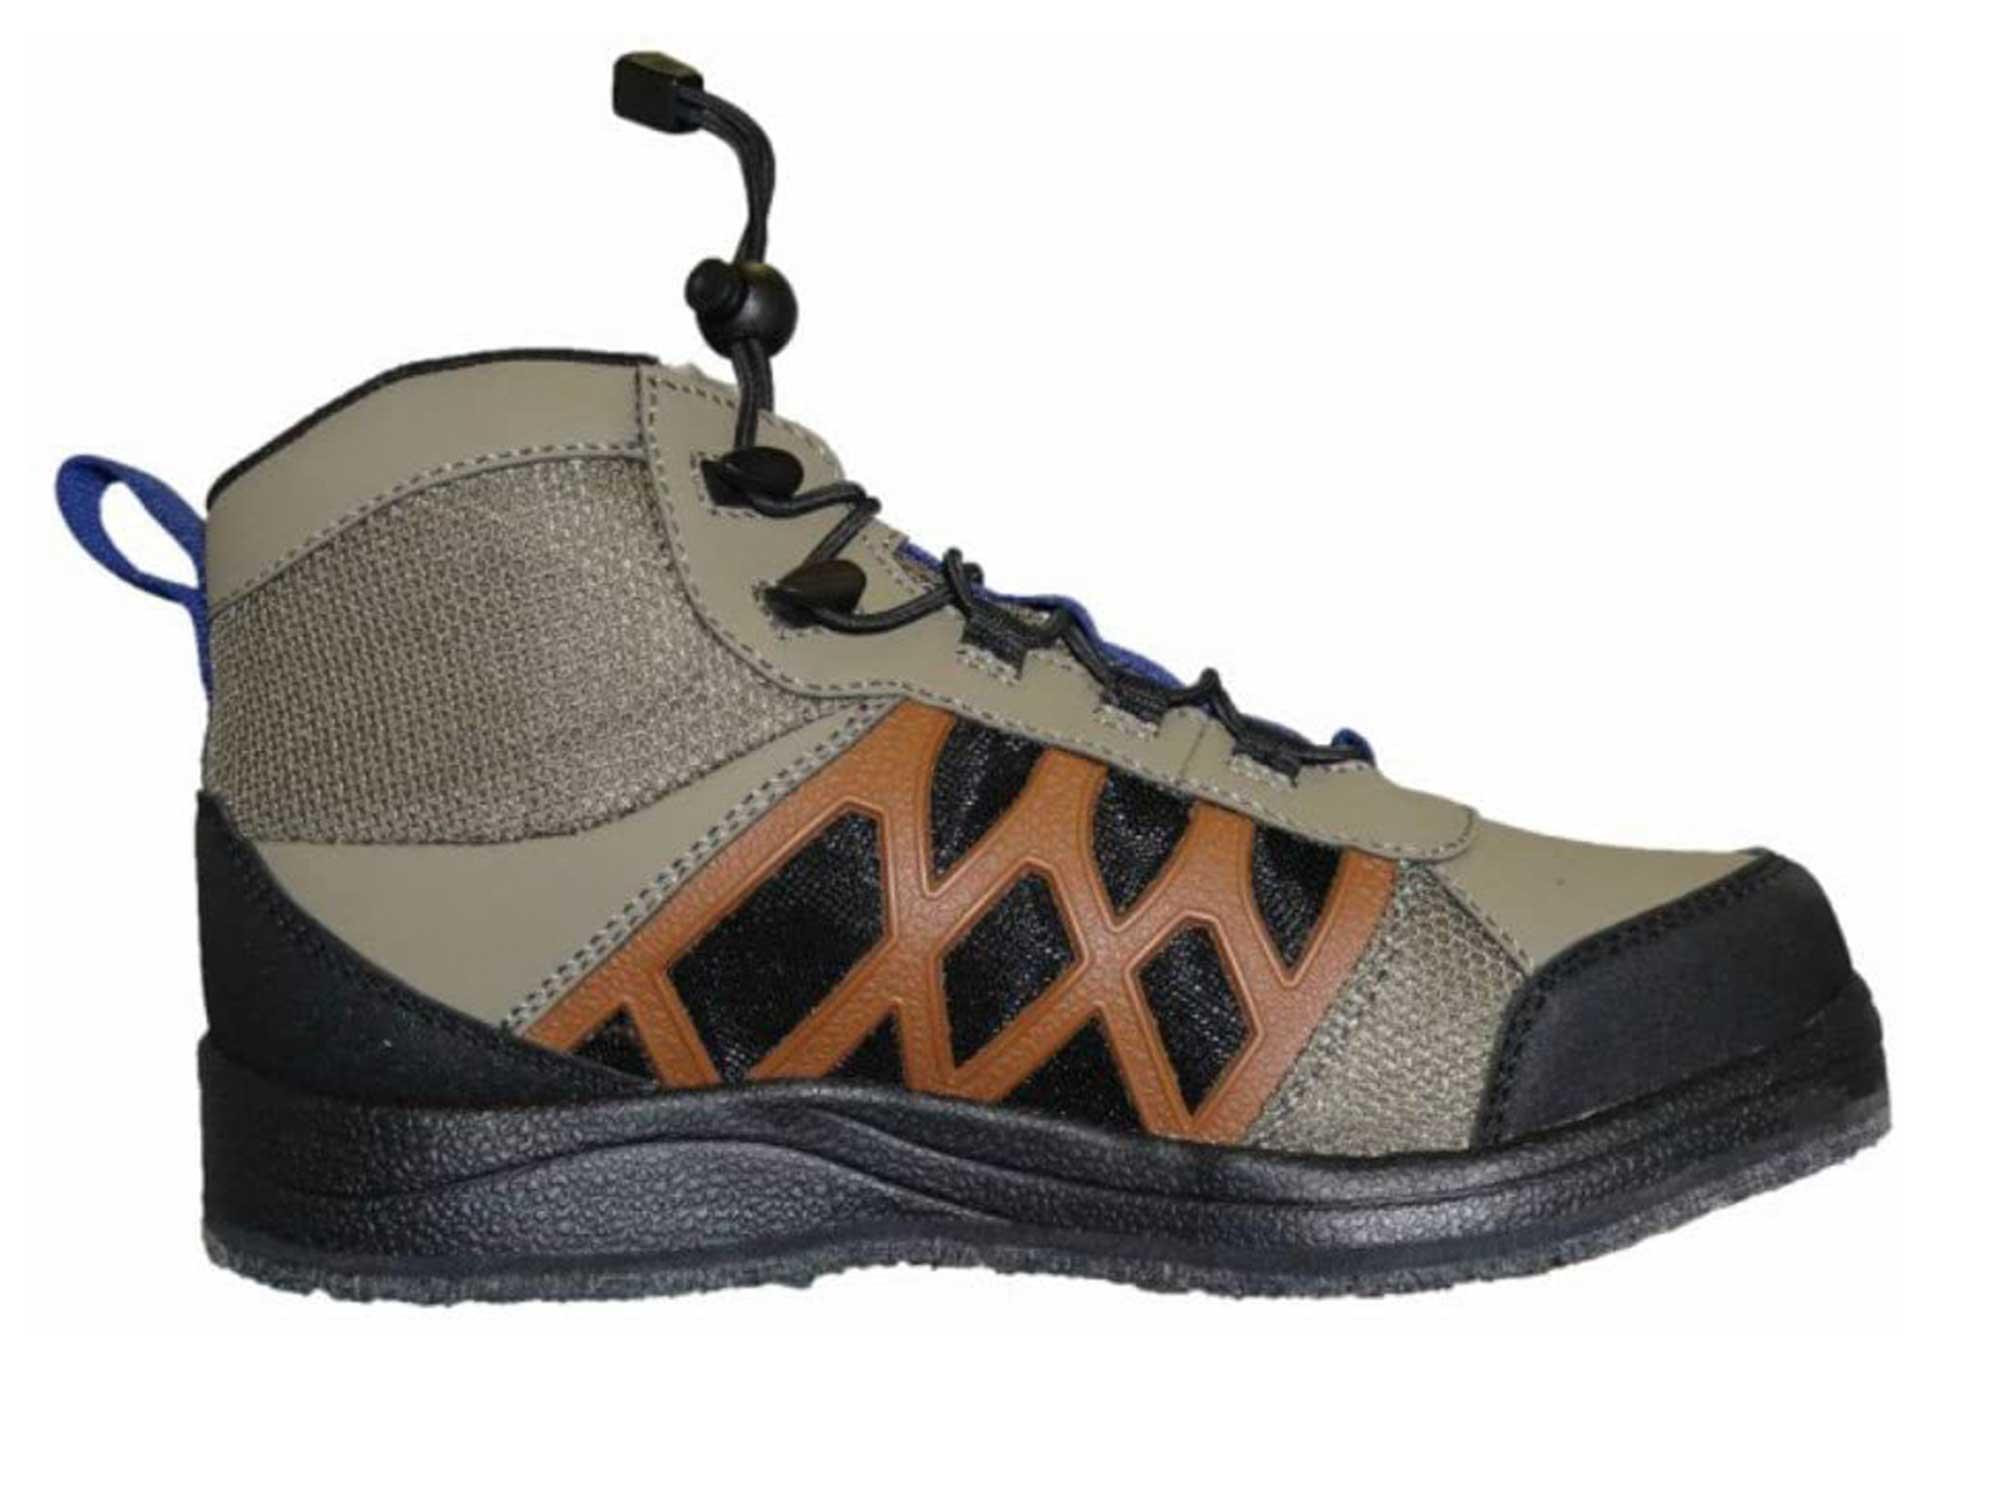 Chota HYFT 700 Hybrid Wading Boot